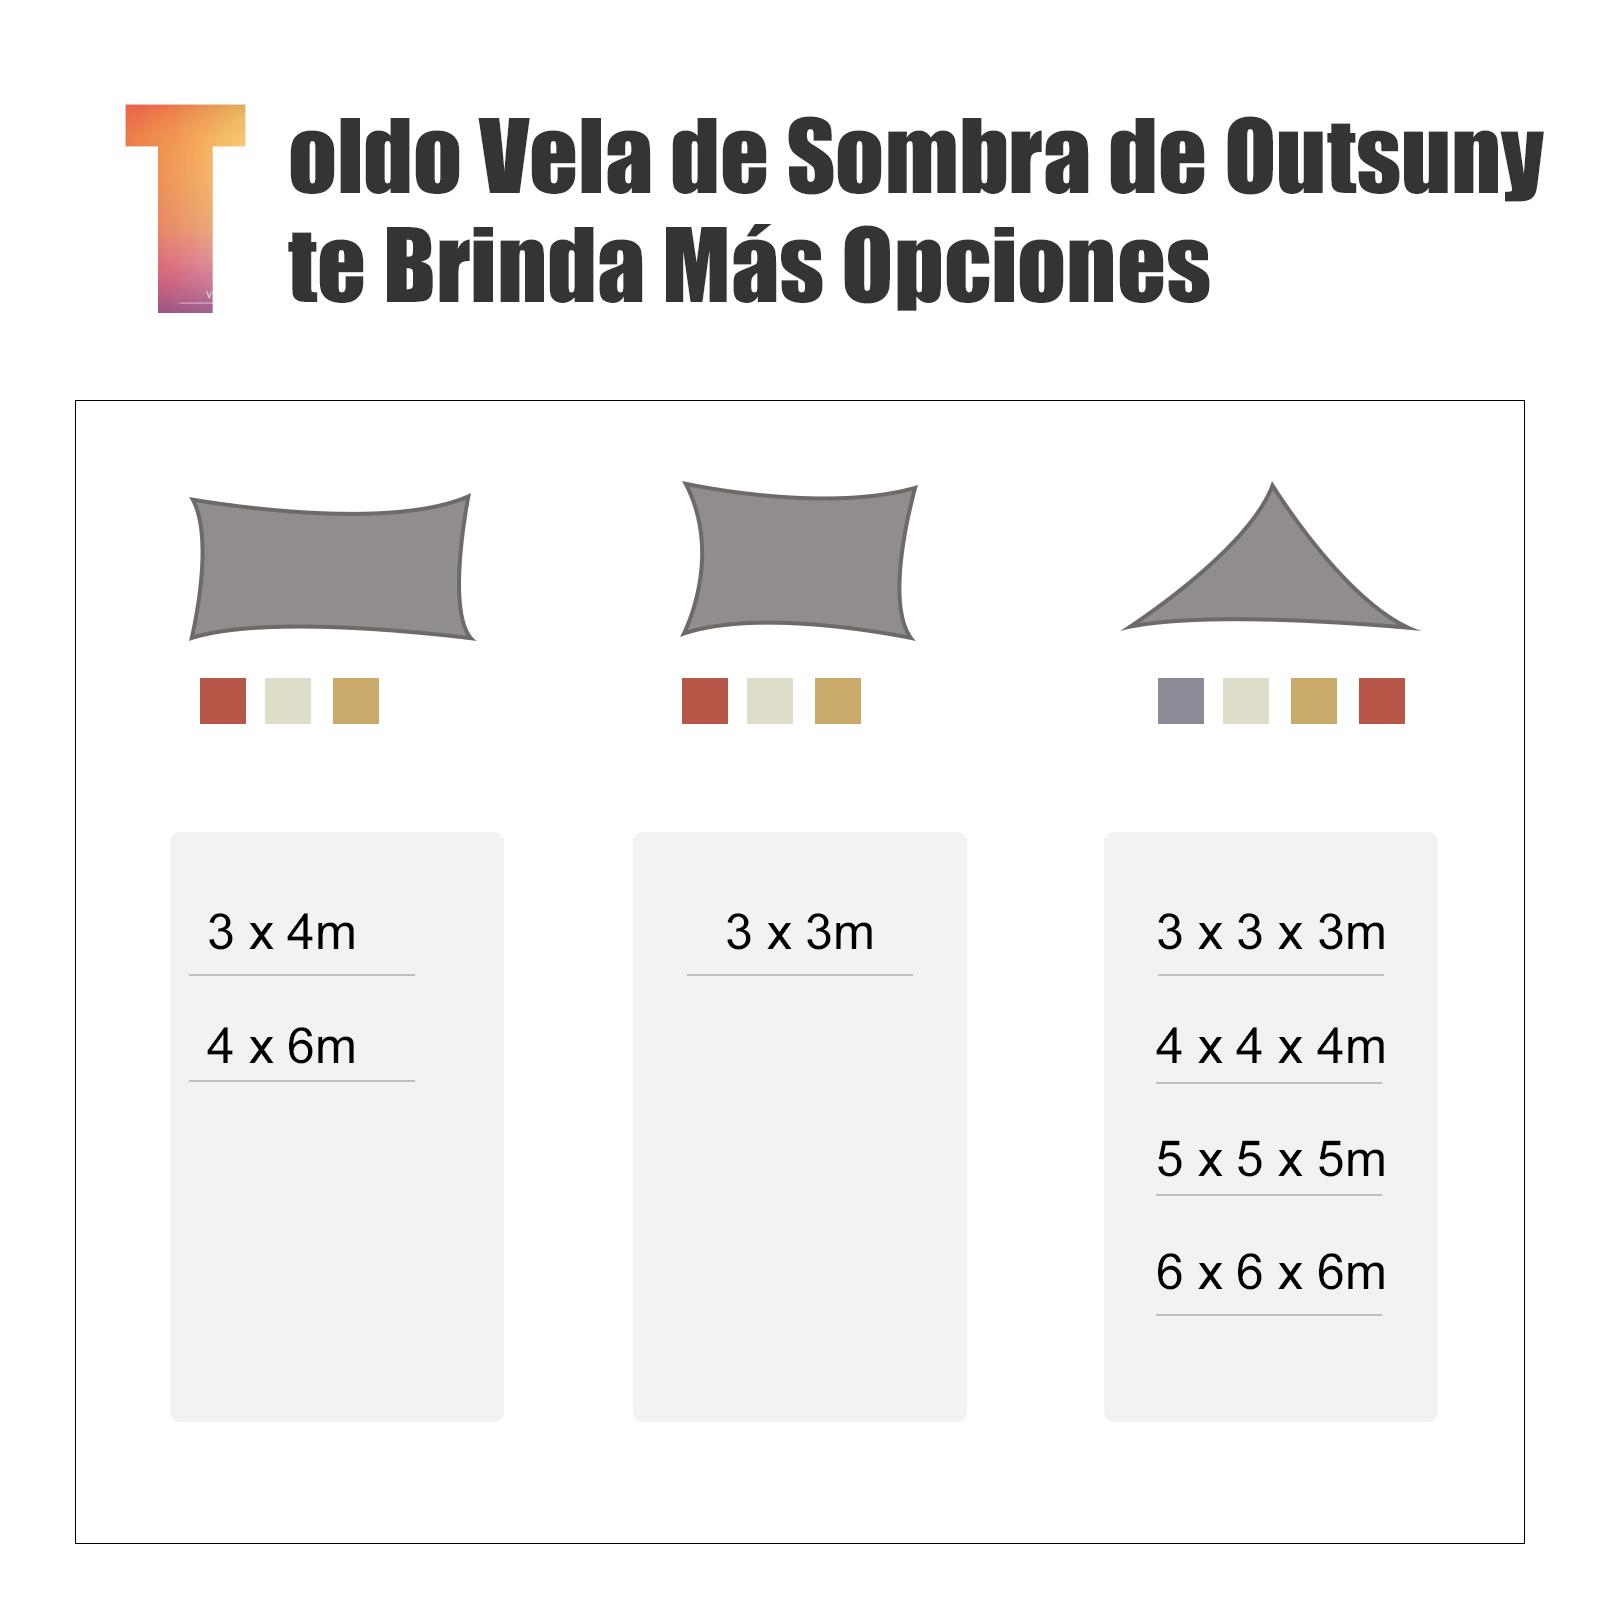 Toldo-Vela-Sombrilla-Parasol-Triangulo-Tejido-de-Poliester-160g-m2-Jardin-Playa miniatura 8